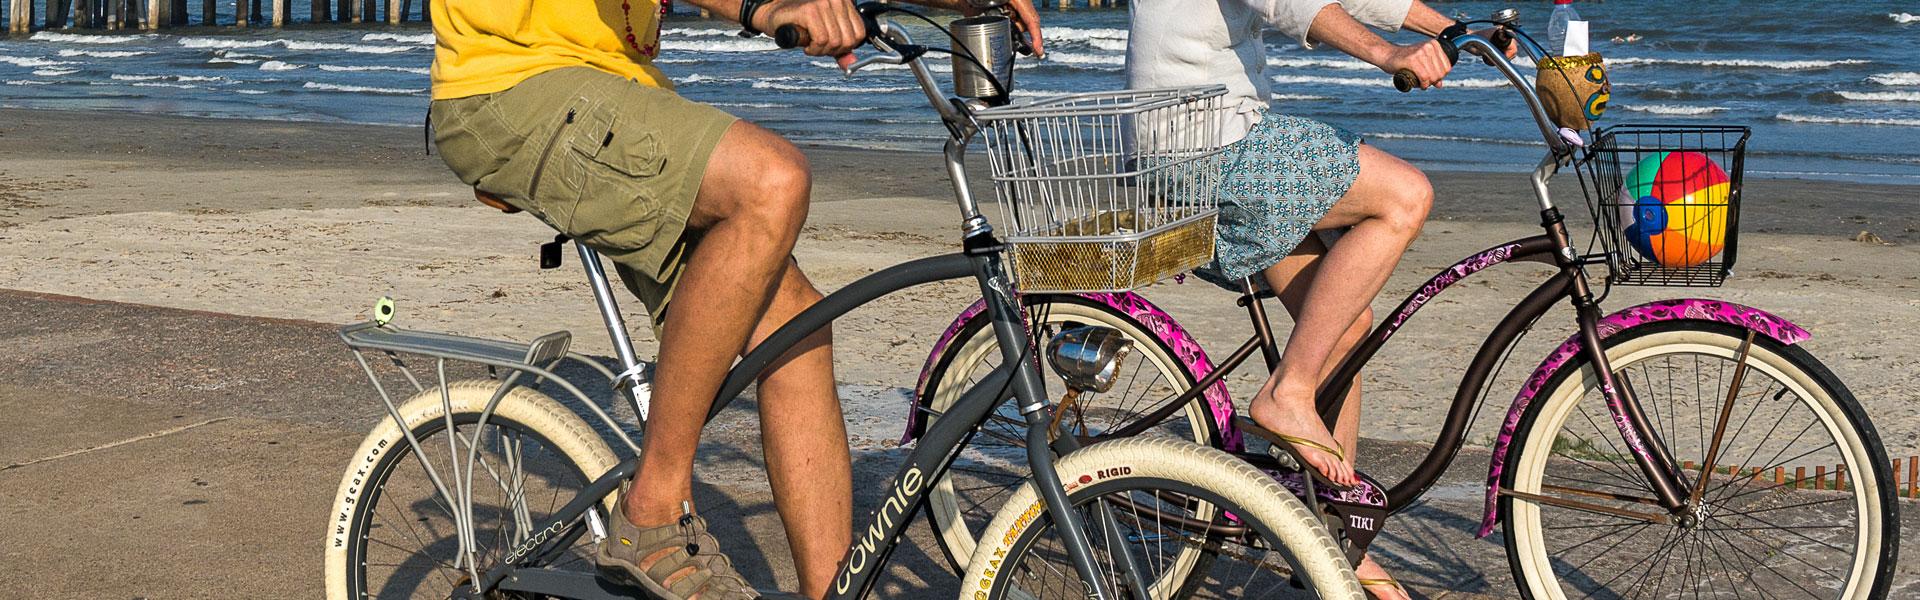 Couple Biking Along Seawall Boulevard, Galveston TX